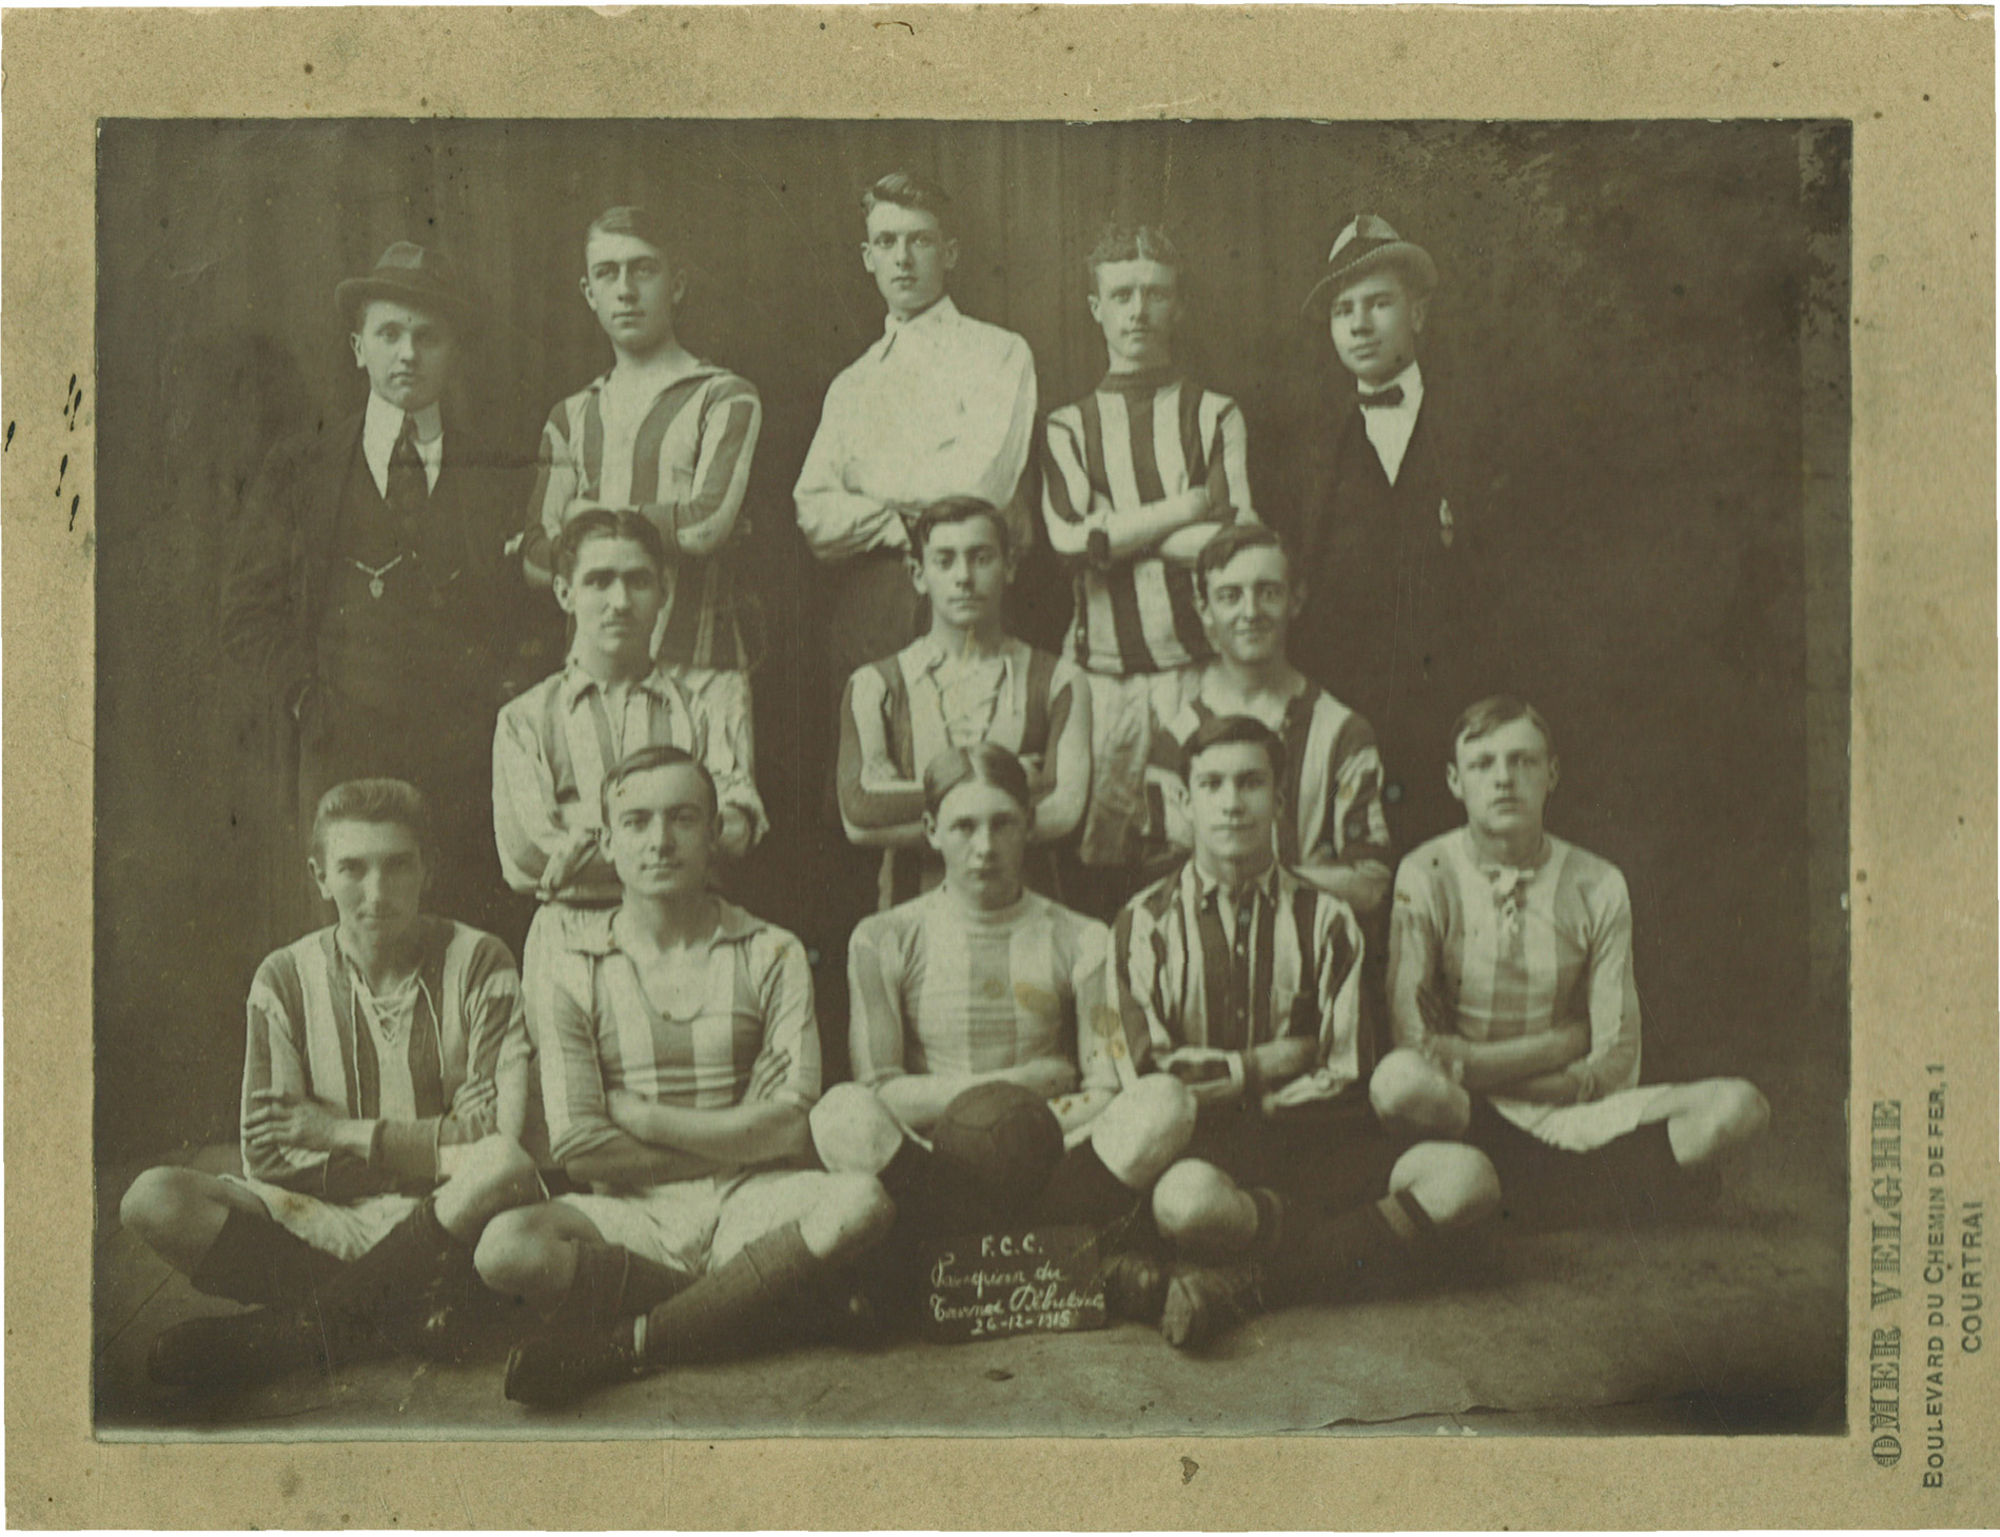 Football Club Coutraisien 1915.